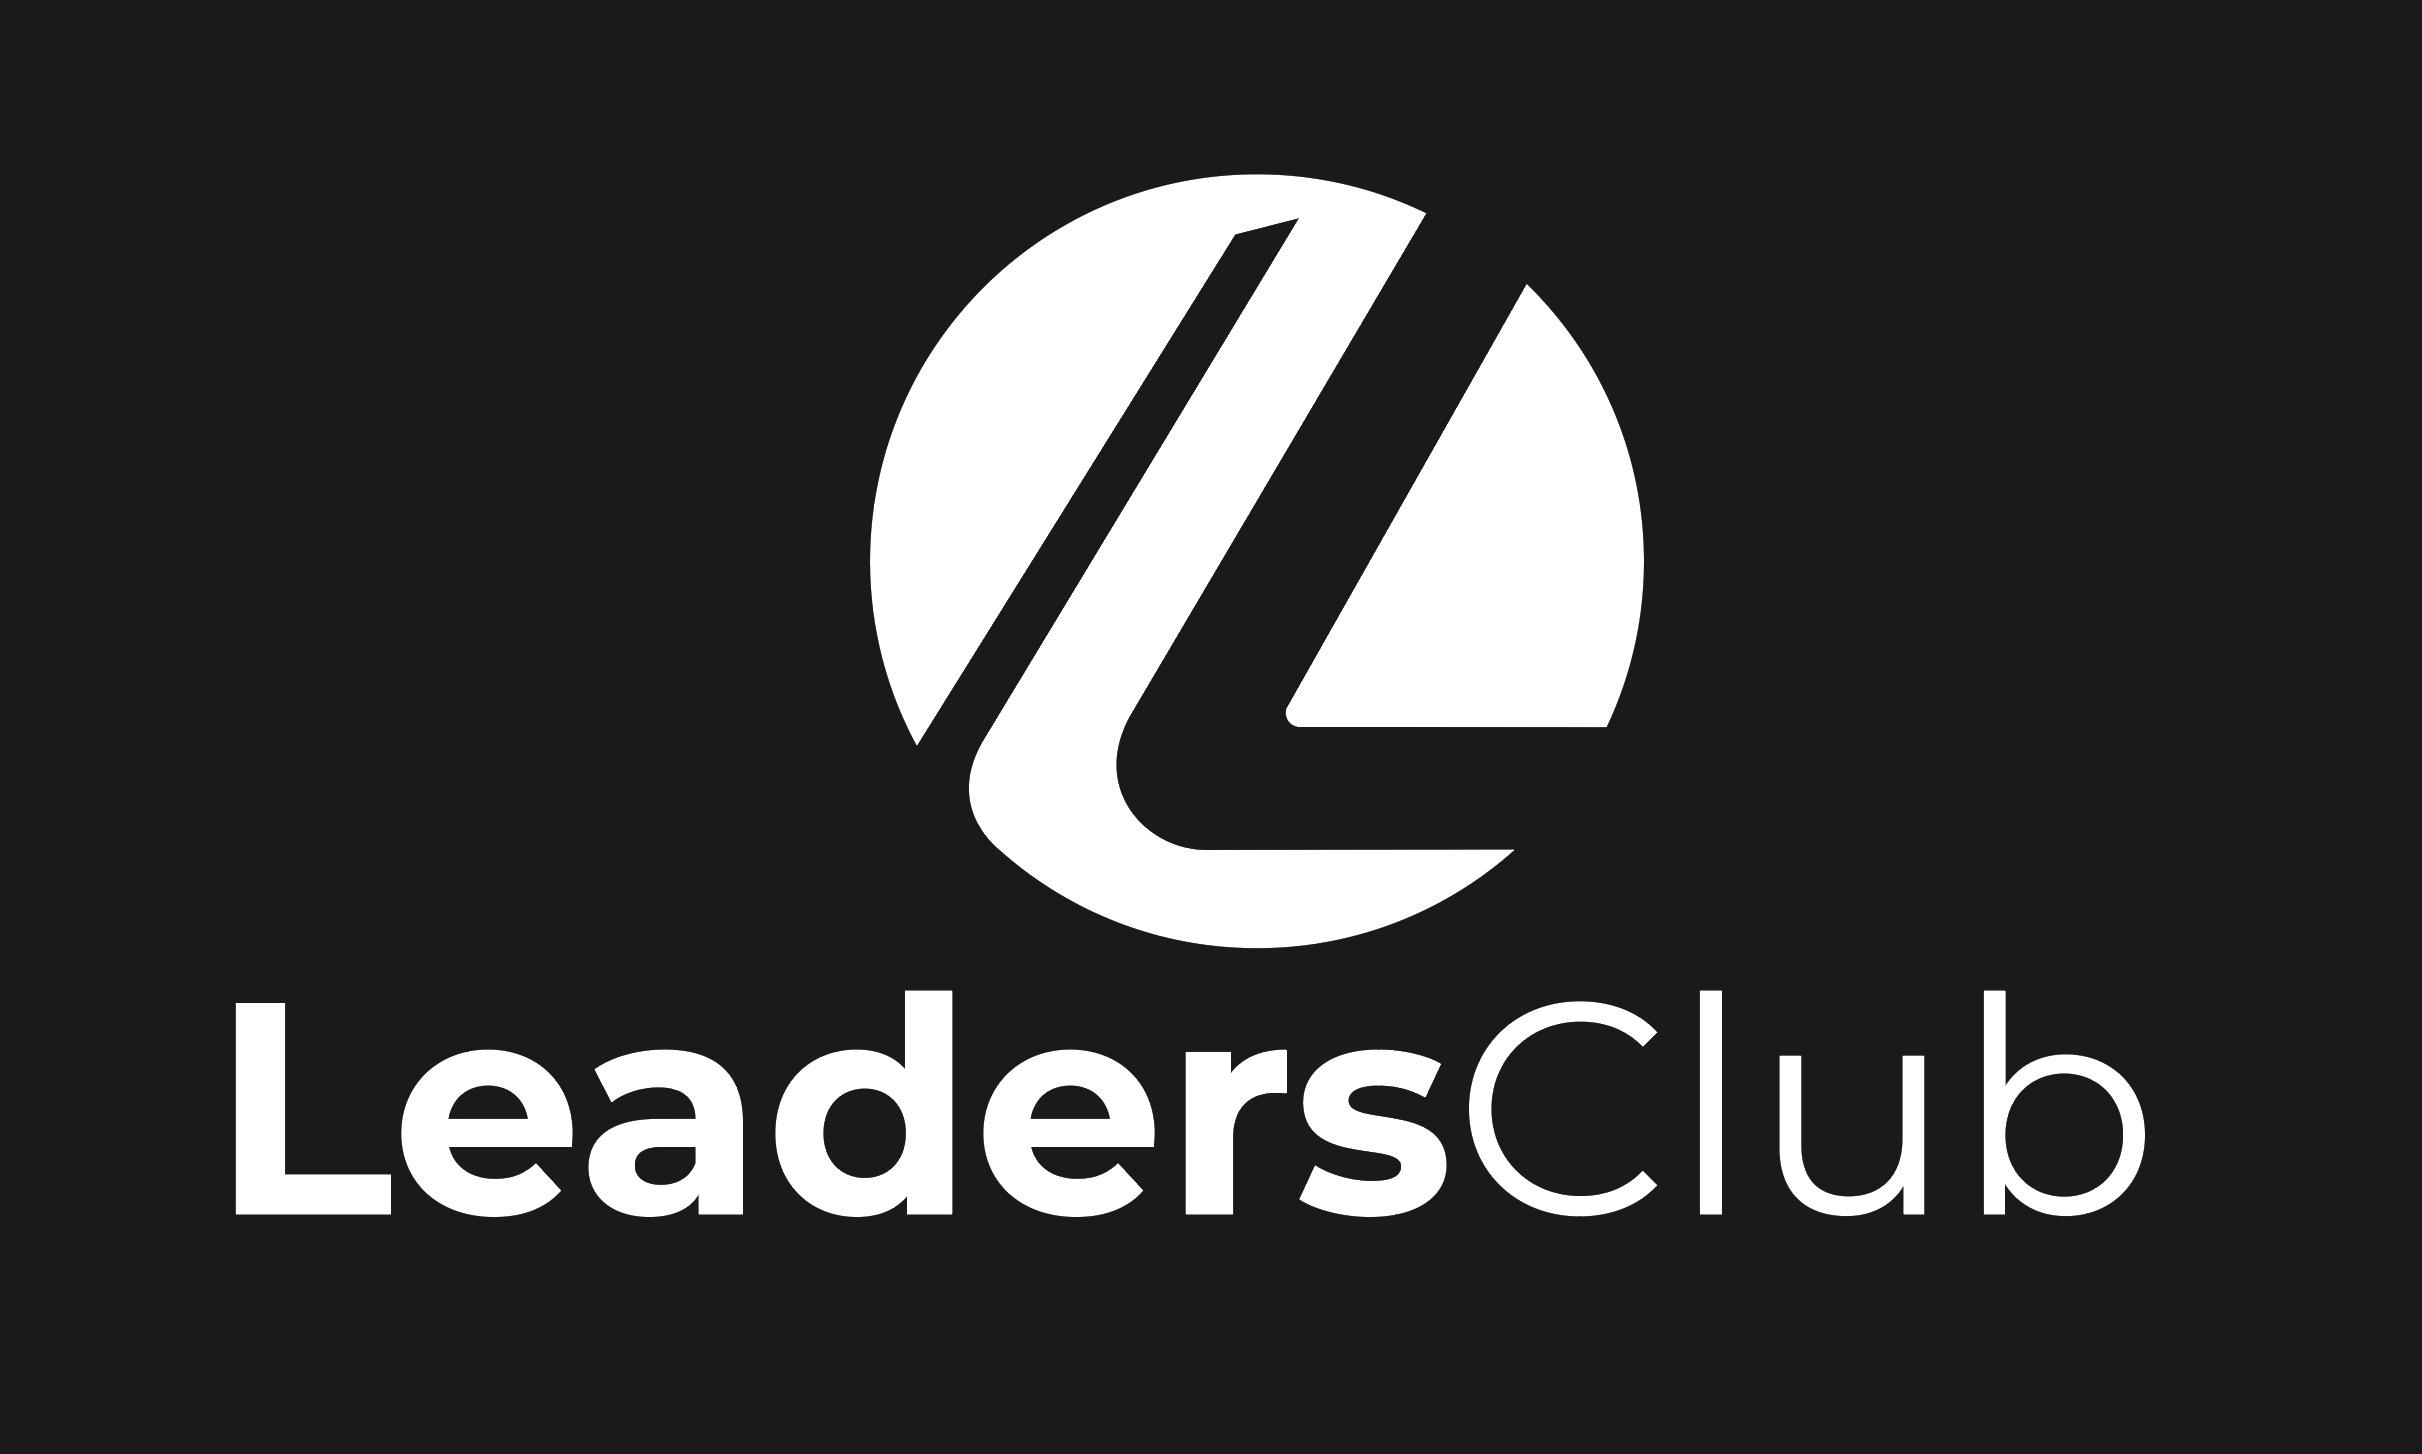 Leaders Club Logo Design